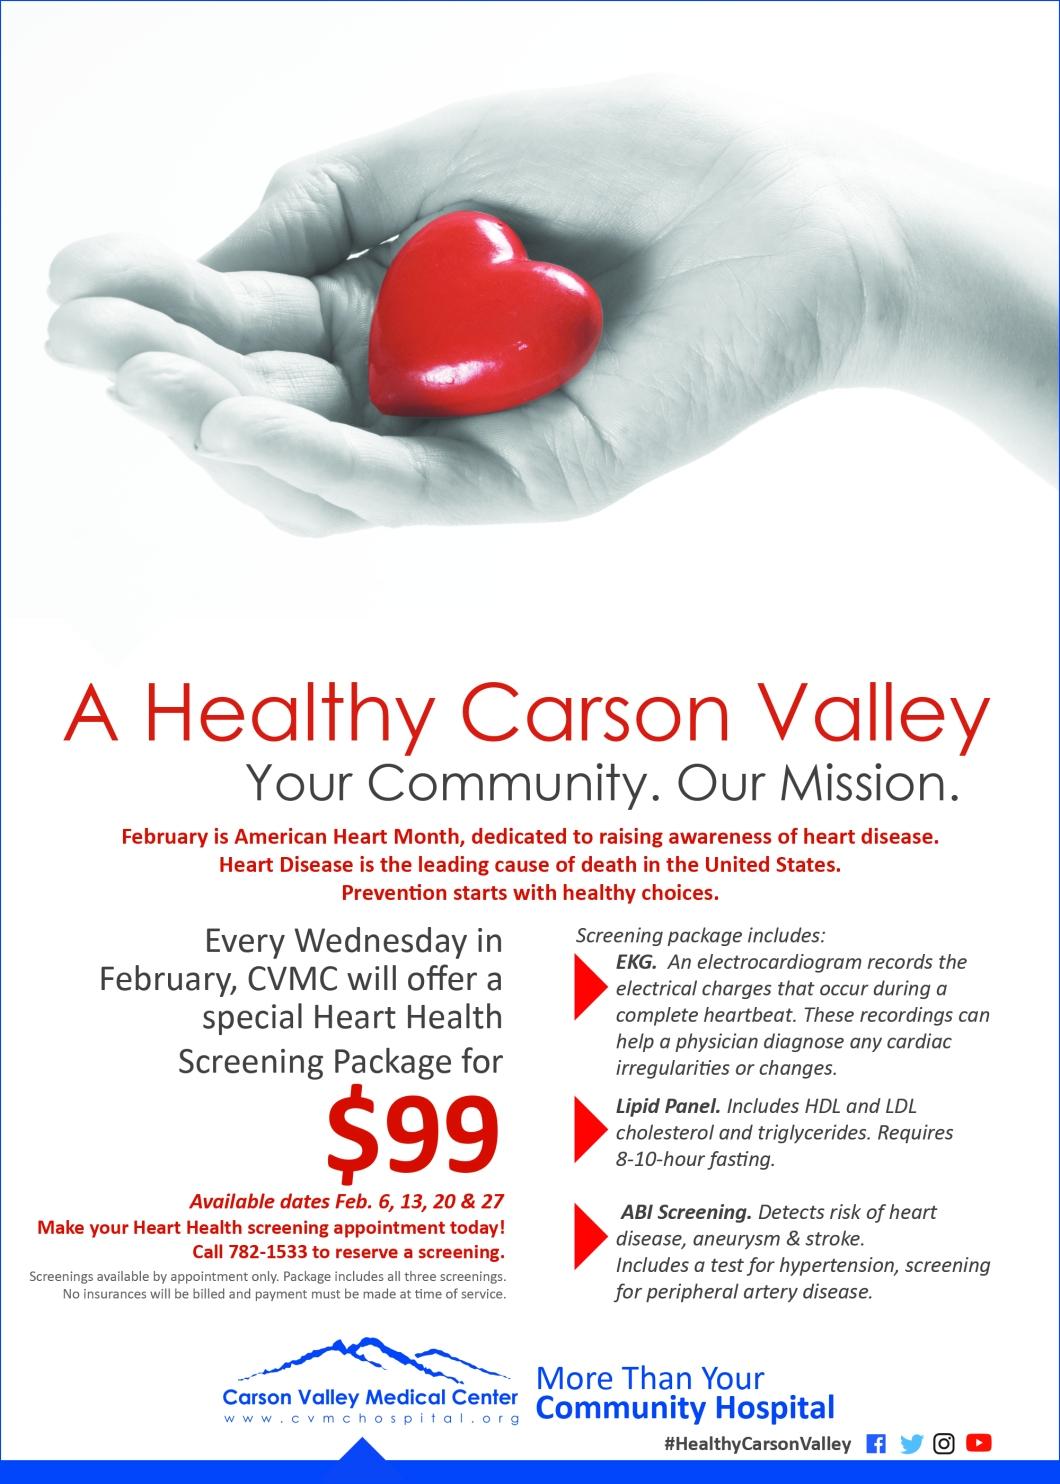 CVMC Heart Health 2019